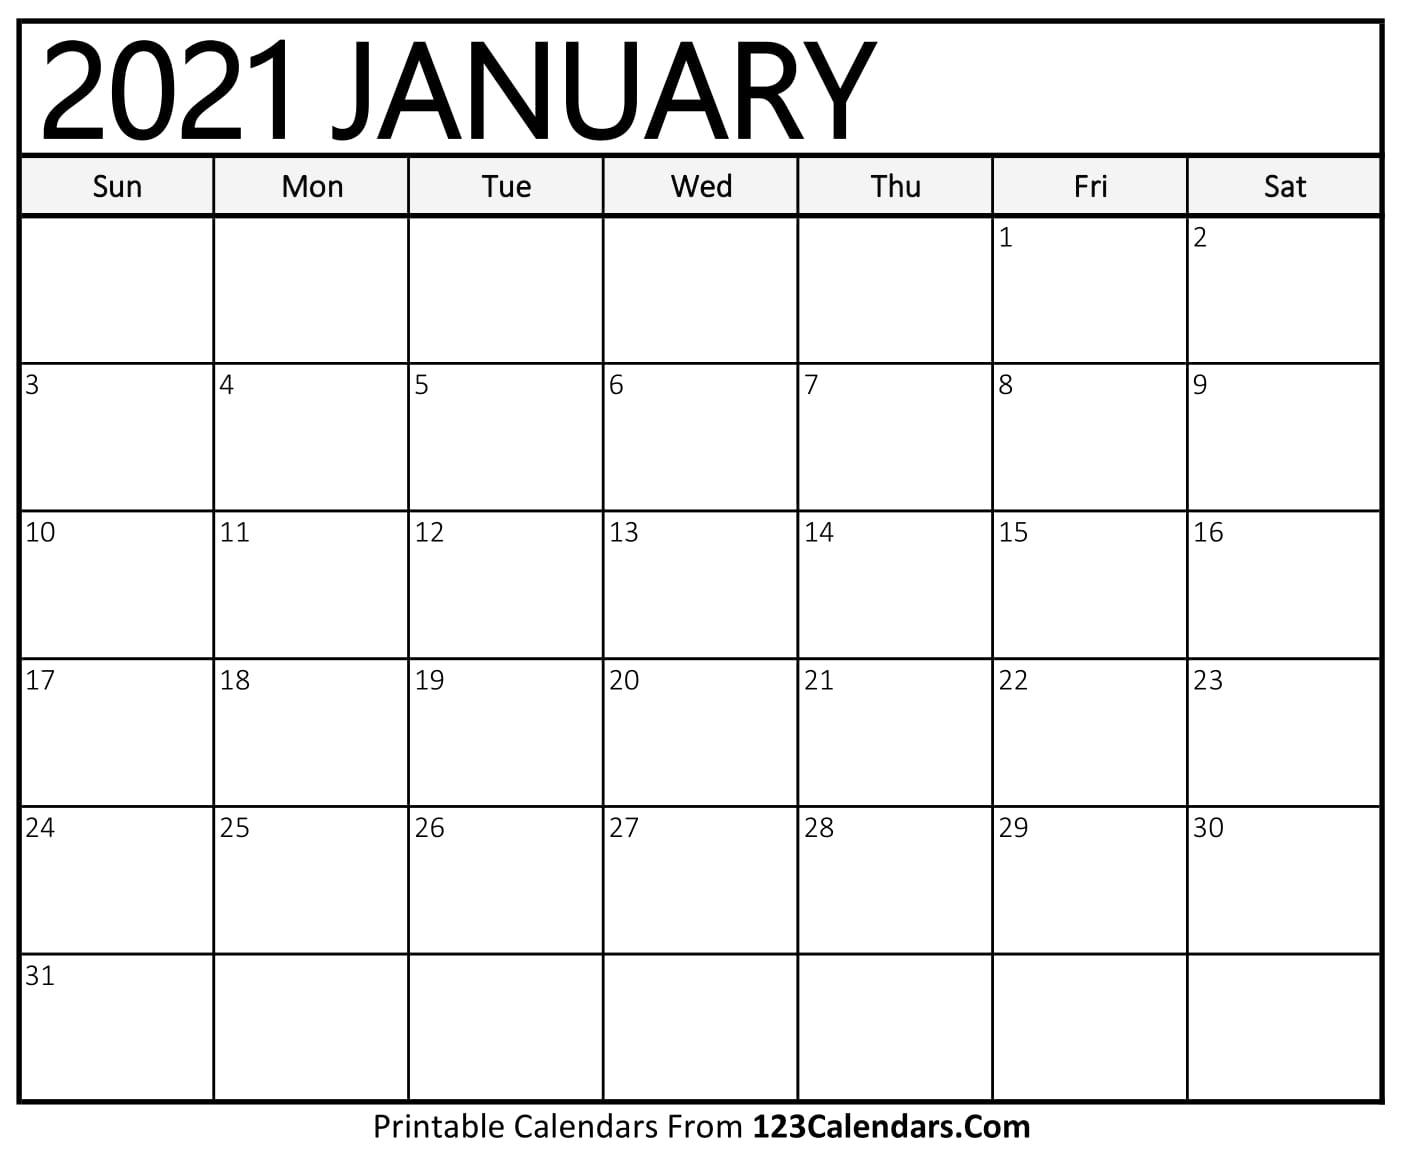 Get Print Off December 2021